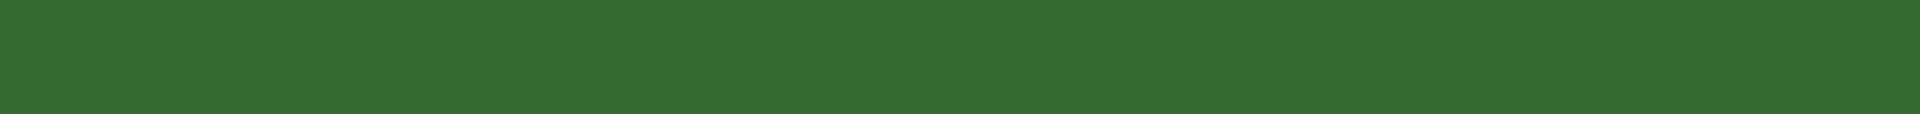 fascia-verde-top